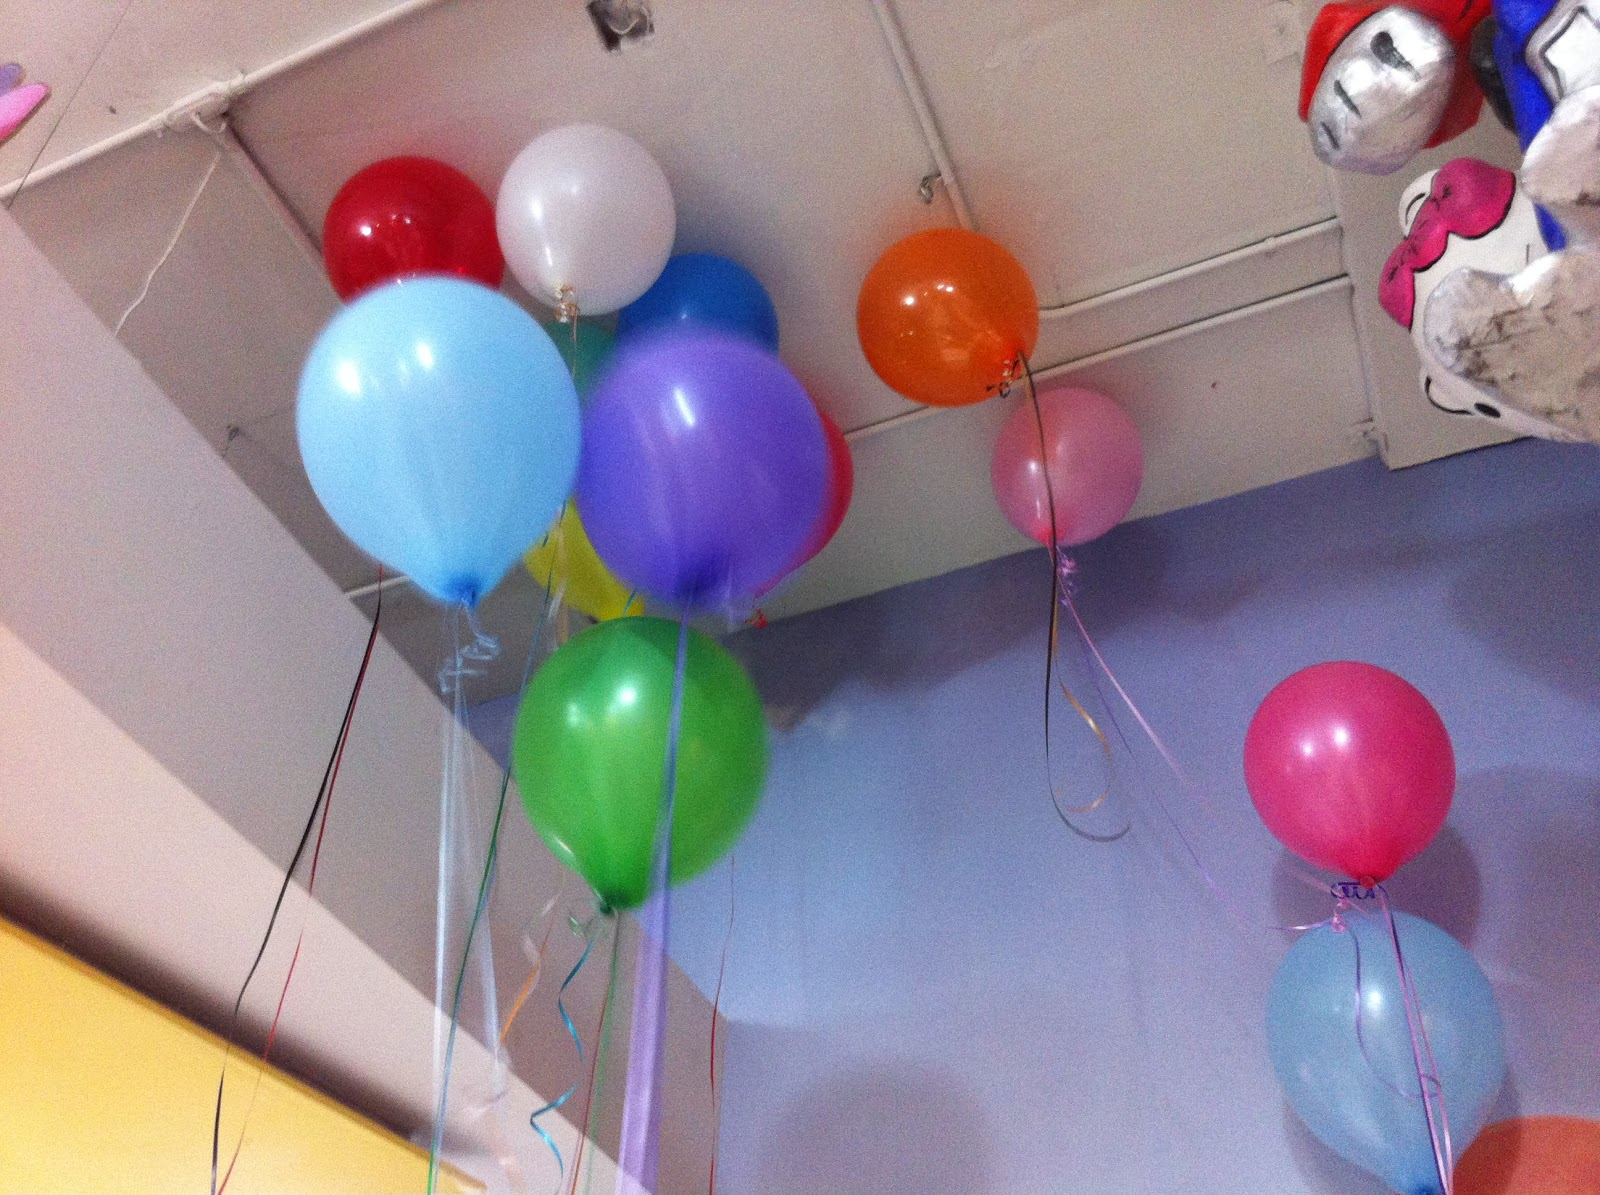 Sorpresas para aniversario imagui for Sorpresas para aniversario